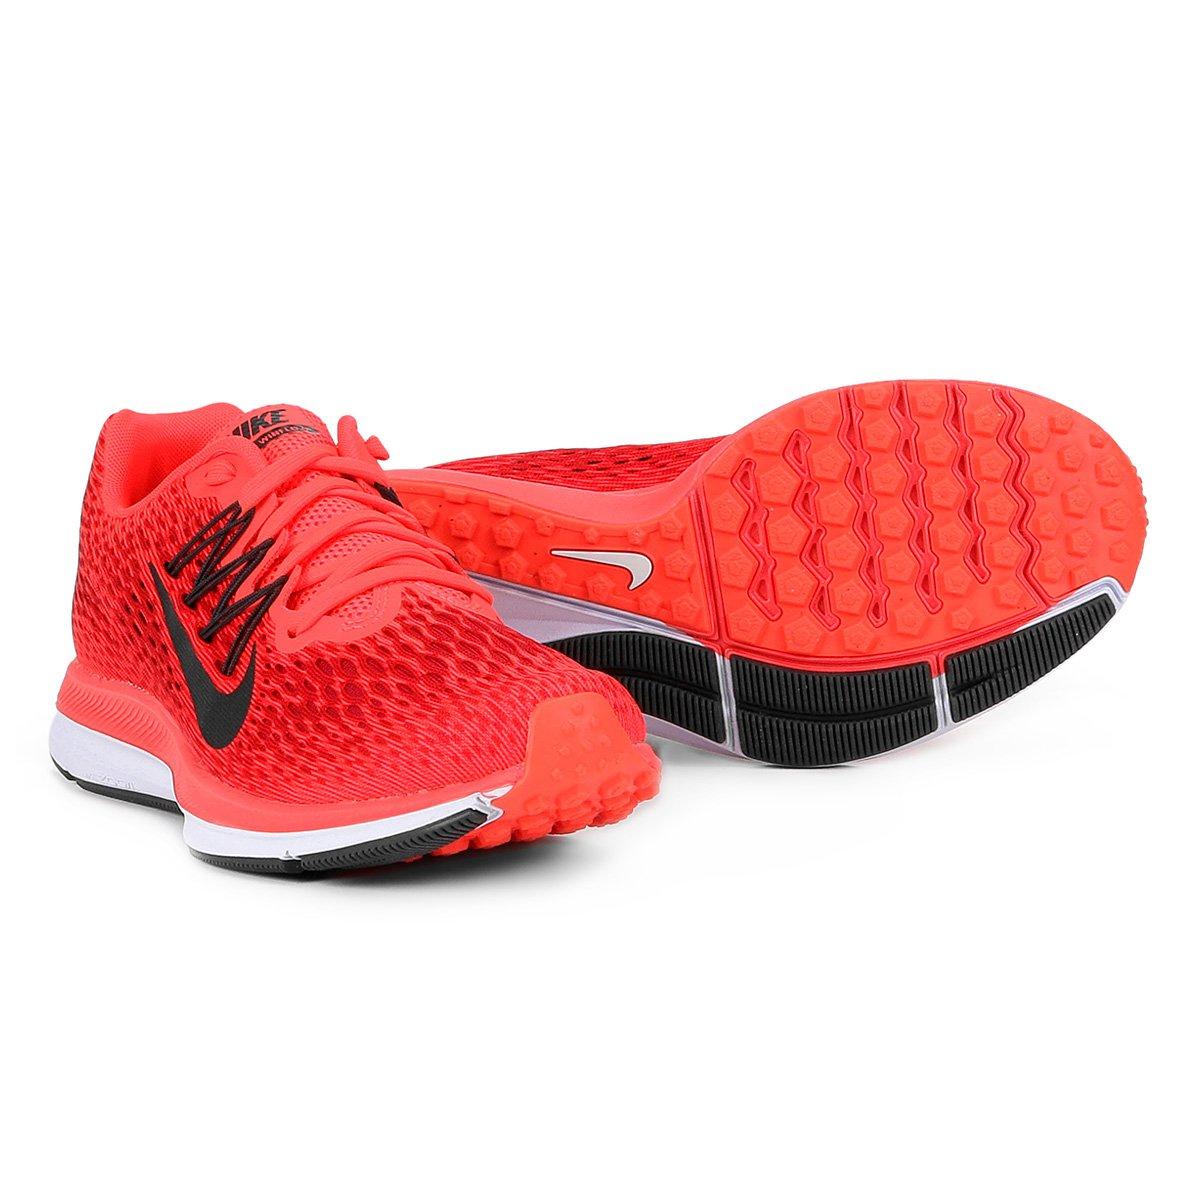 03b46bdd8bfbb Tênis Nike WMNS Zoom Winflo 5 Feminino - Vermelho - Compre Agora ...